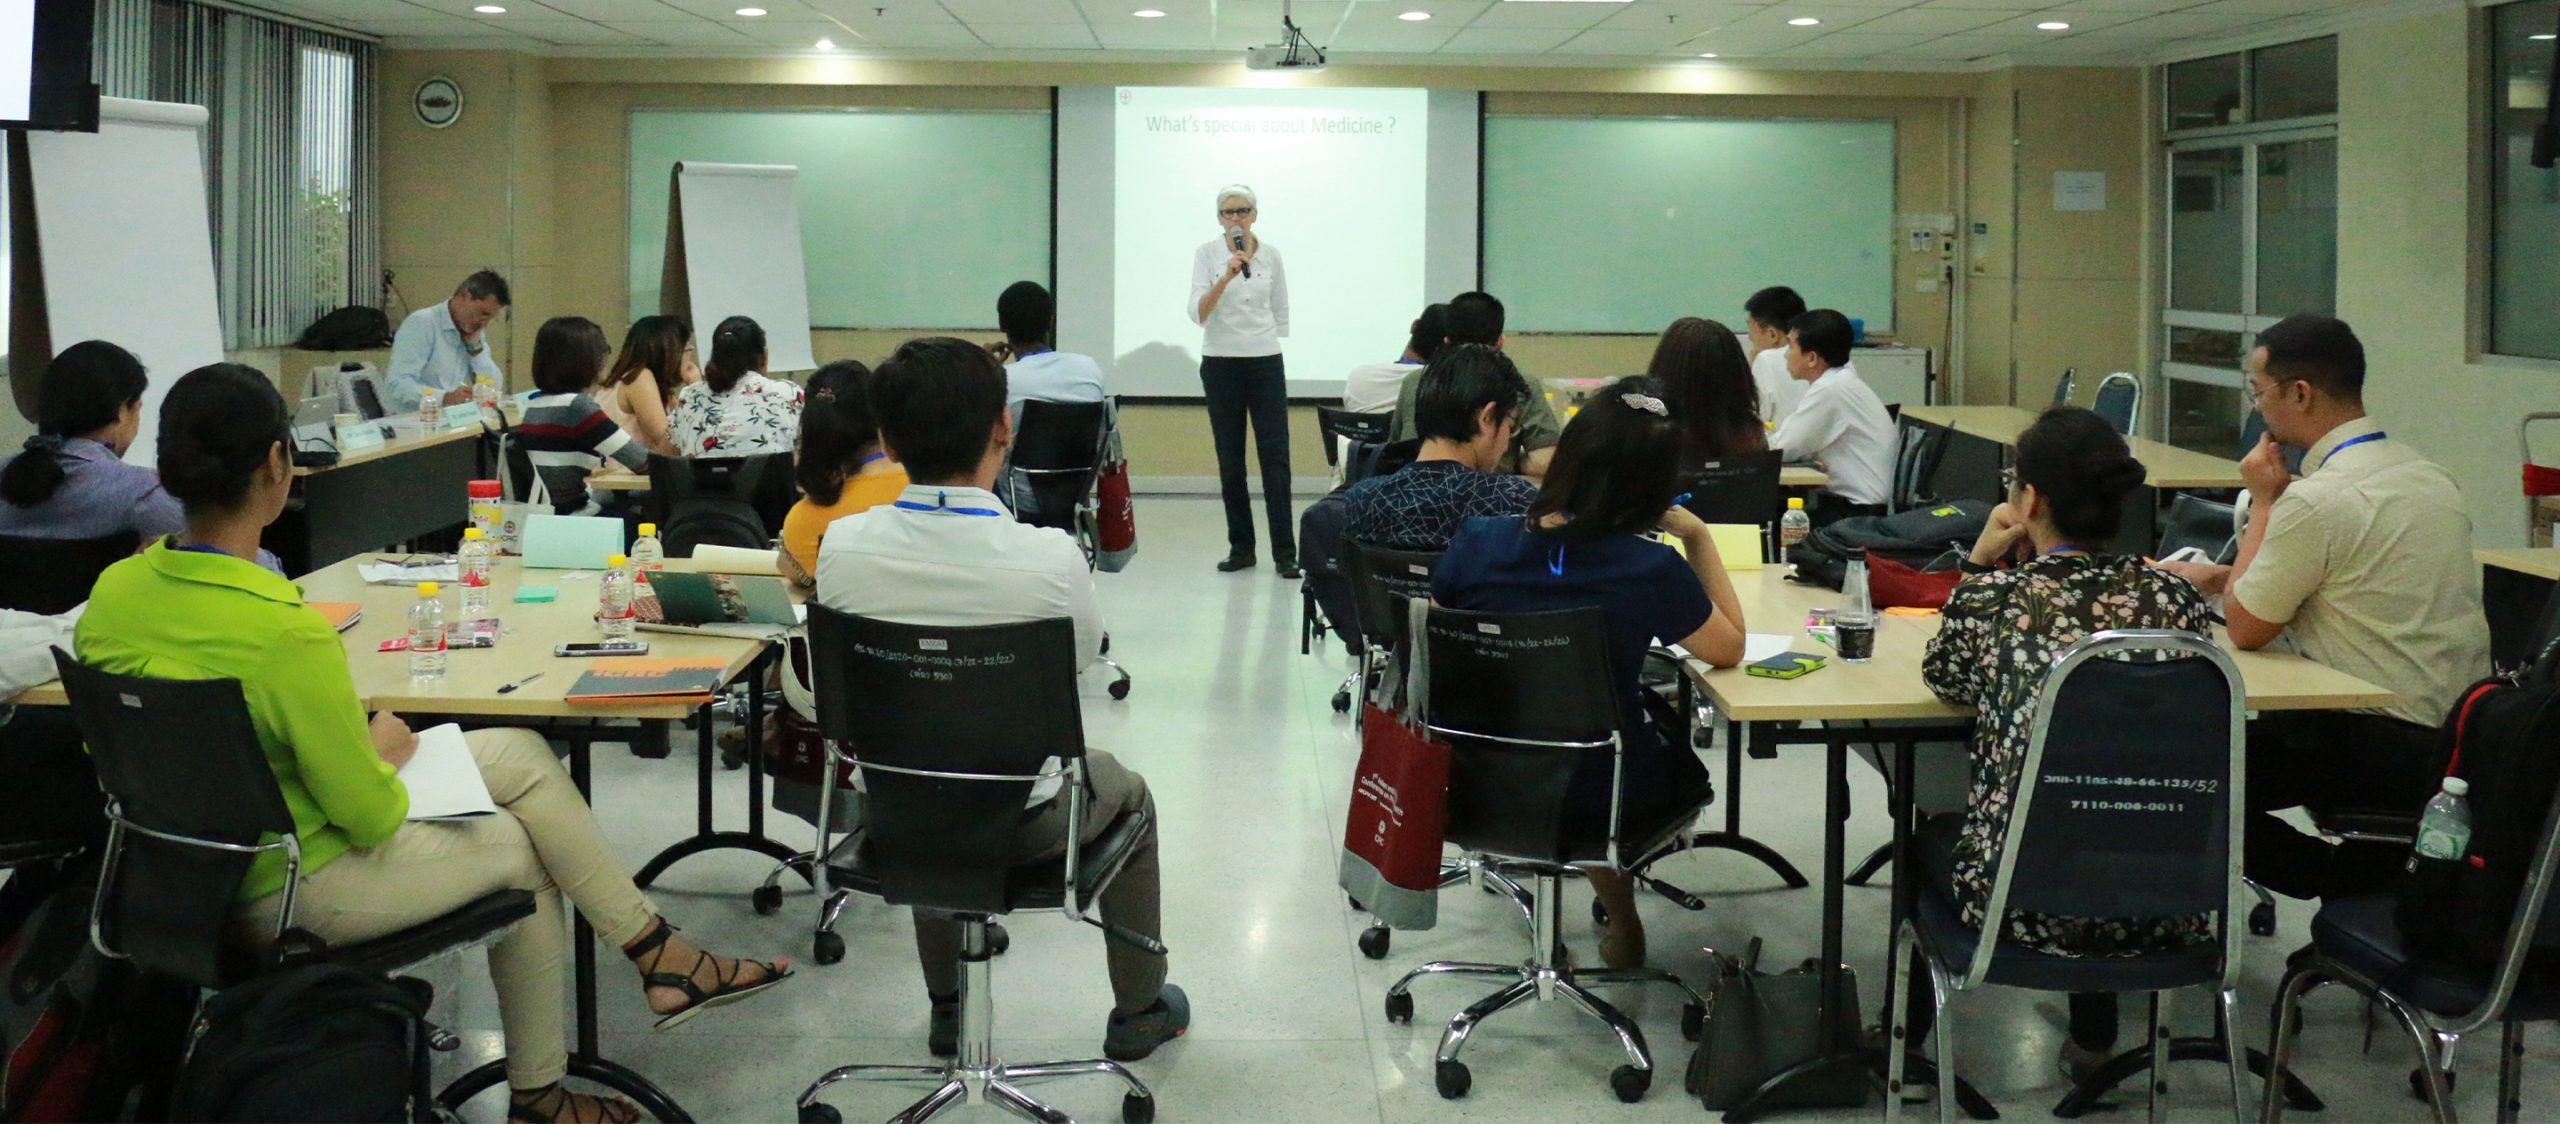 Health In Detention วิชาสร้างตระหนักรู้สุขภาพเรือนจำที่สอนในรั้วธรรมศาสตร์ที่แรกในเอเชียแปซิฟิก